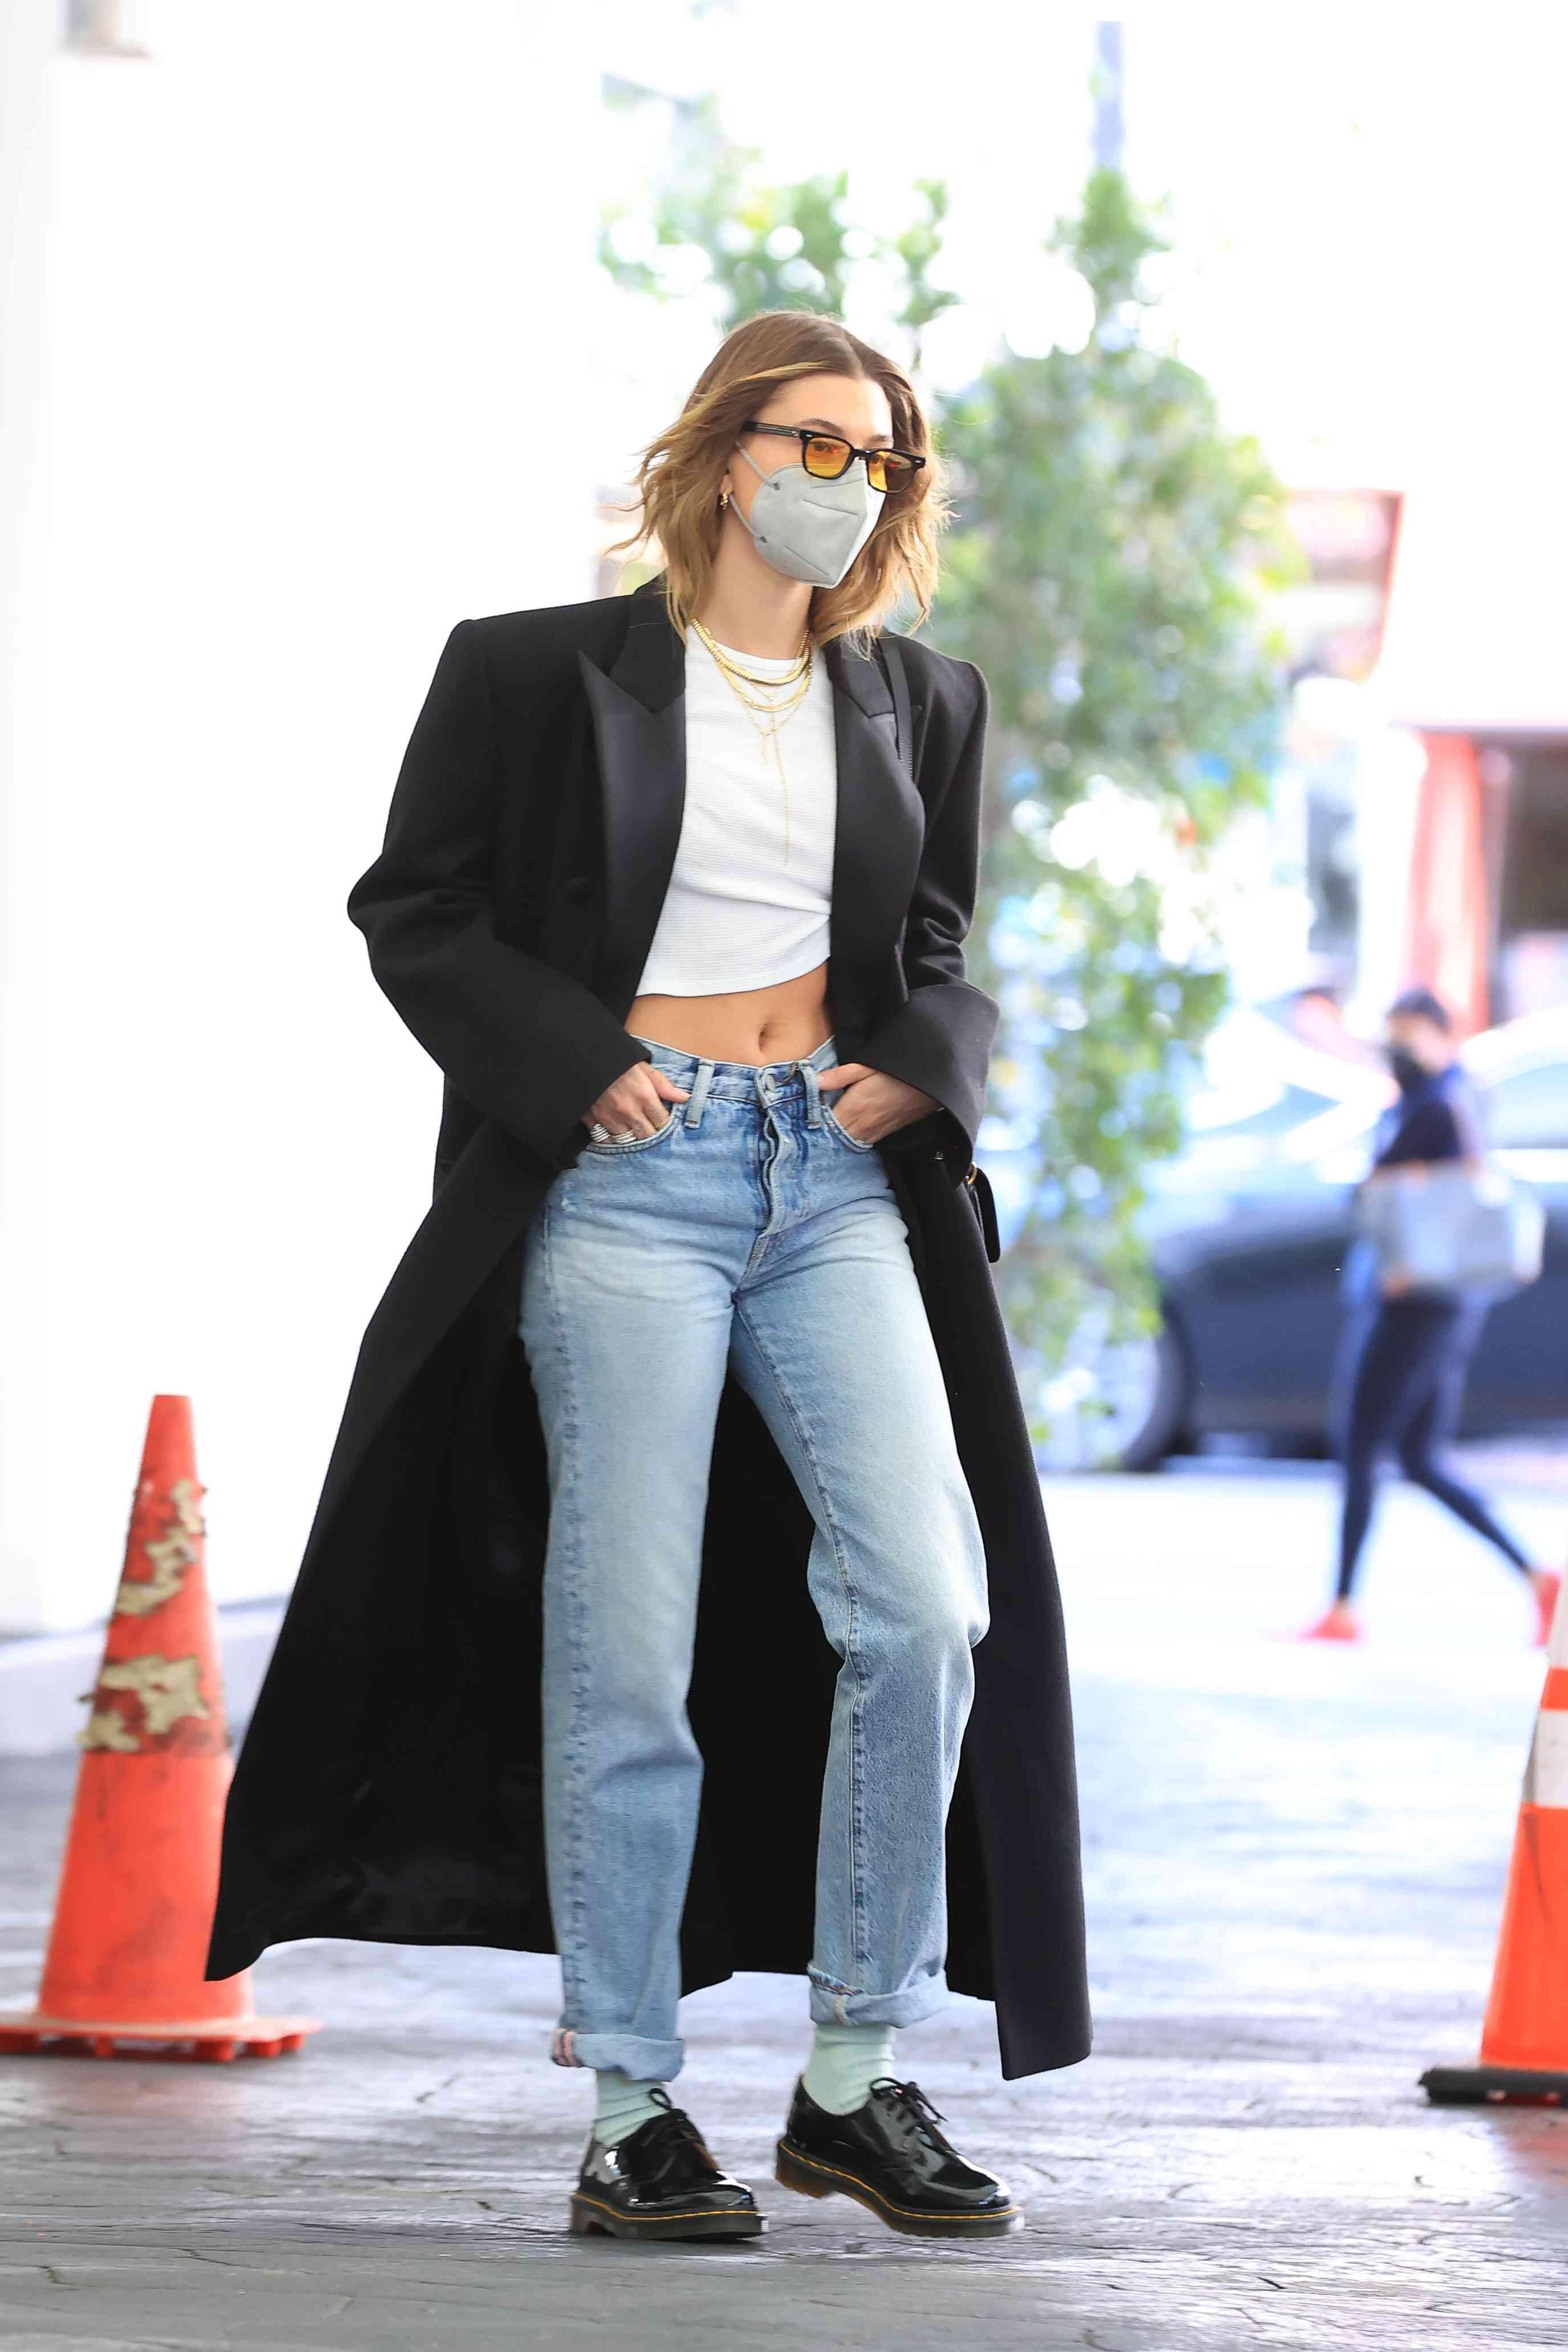 Dr. Martens Outfits Uniform Hailey Bieber Street Style